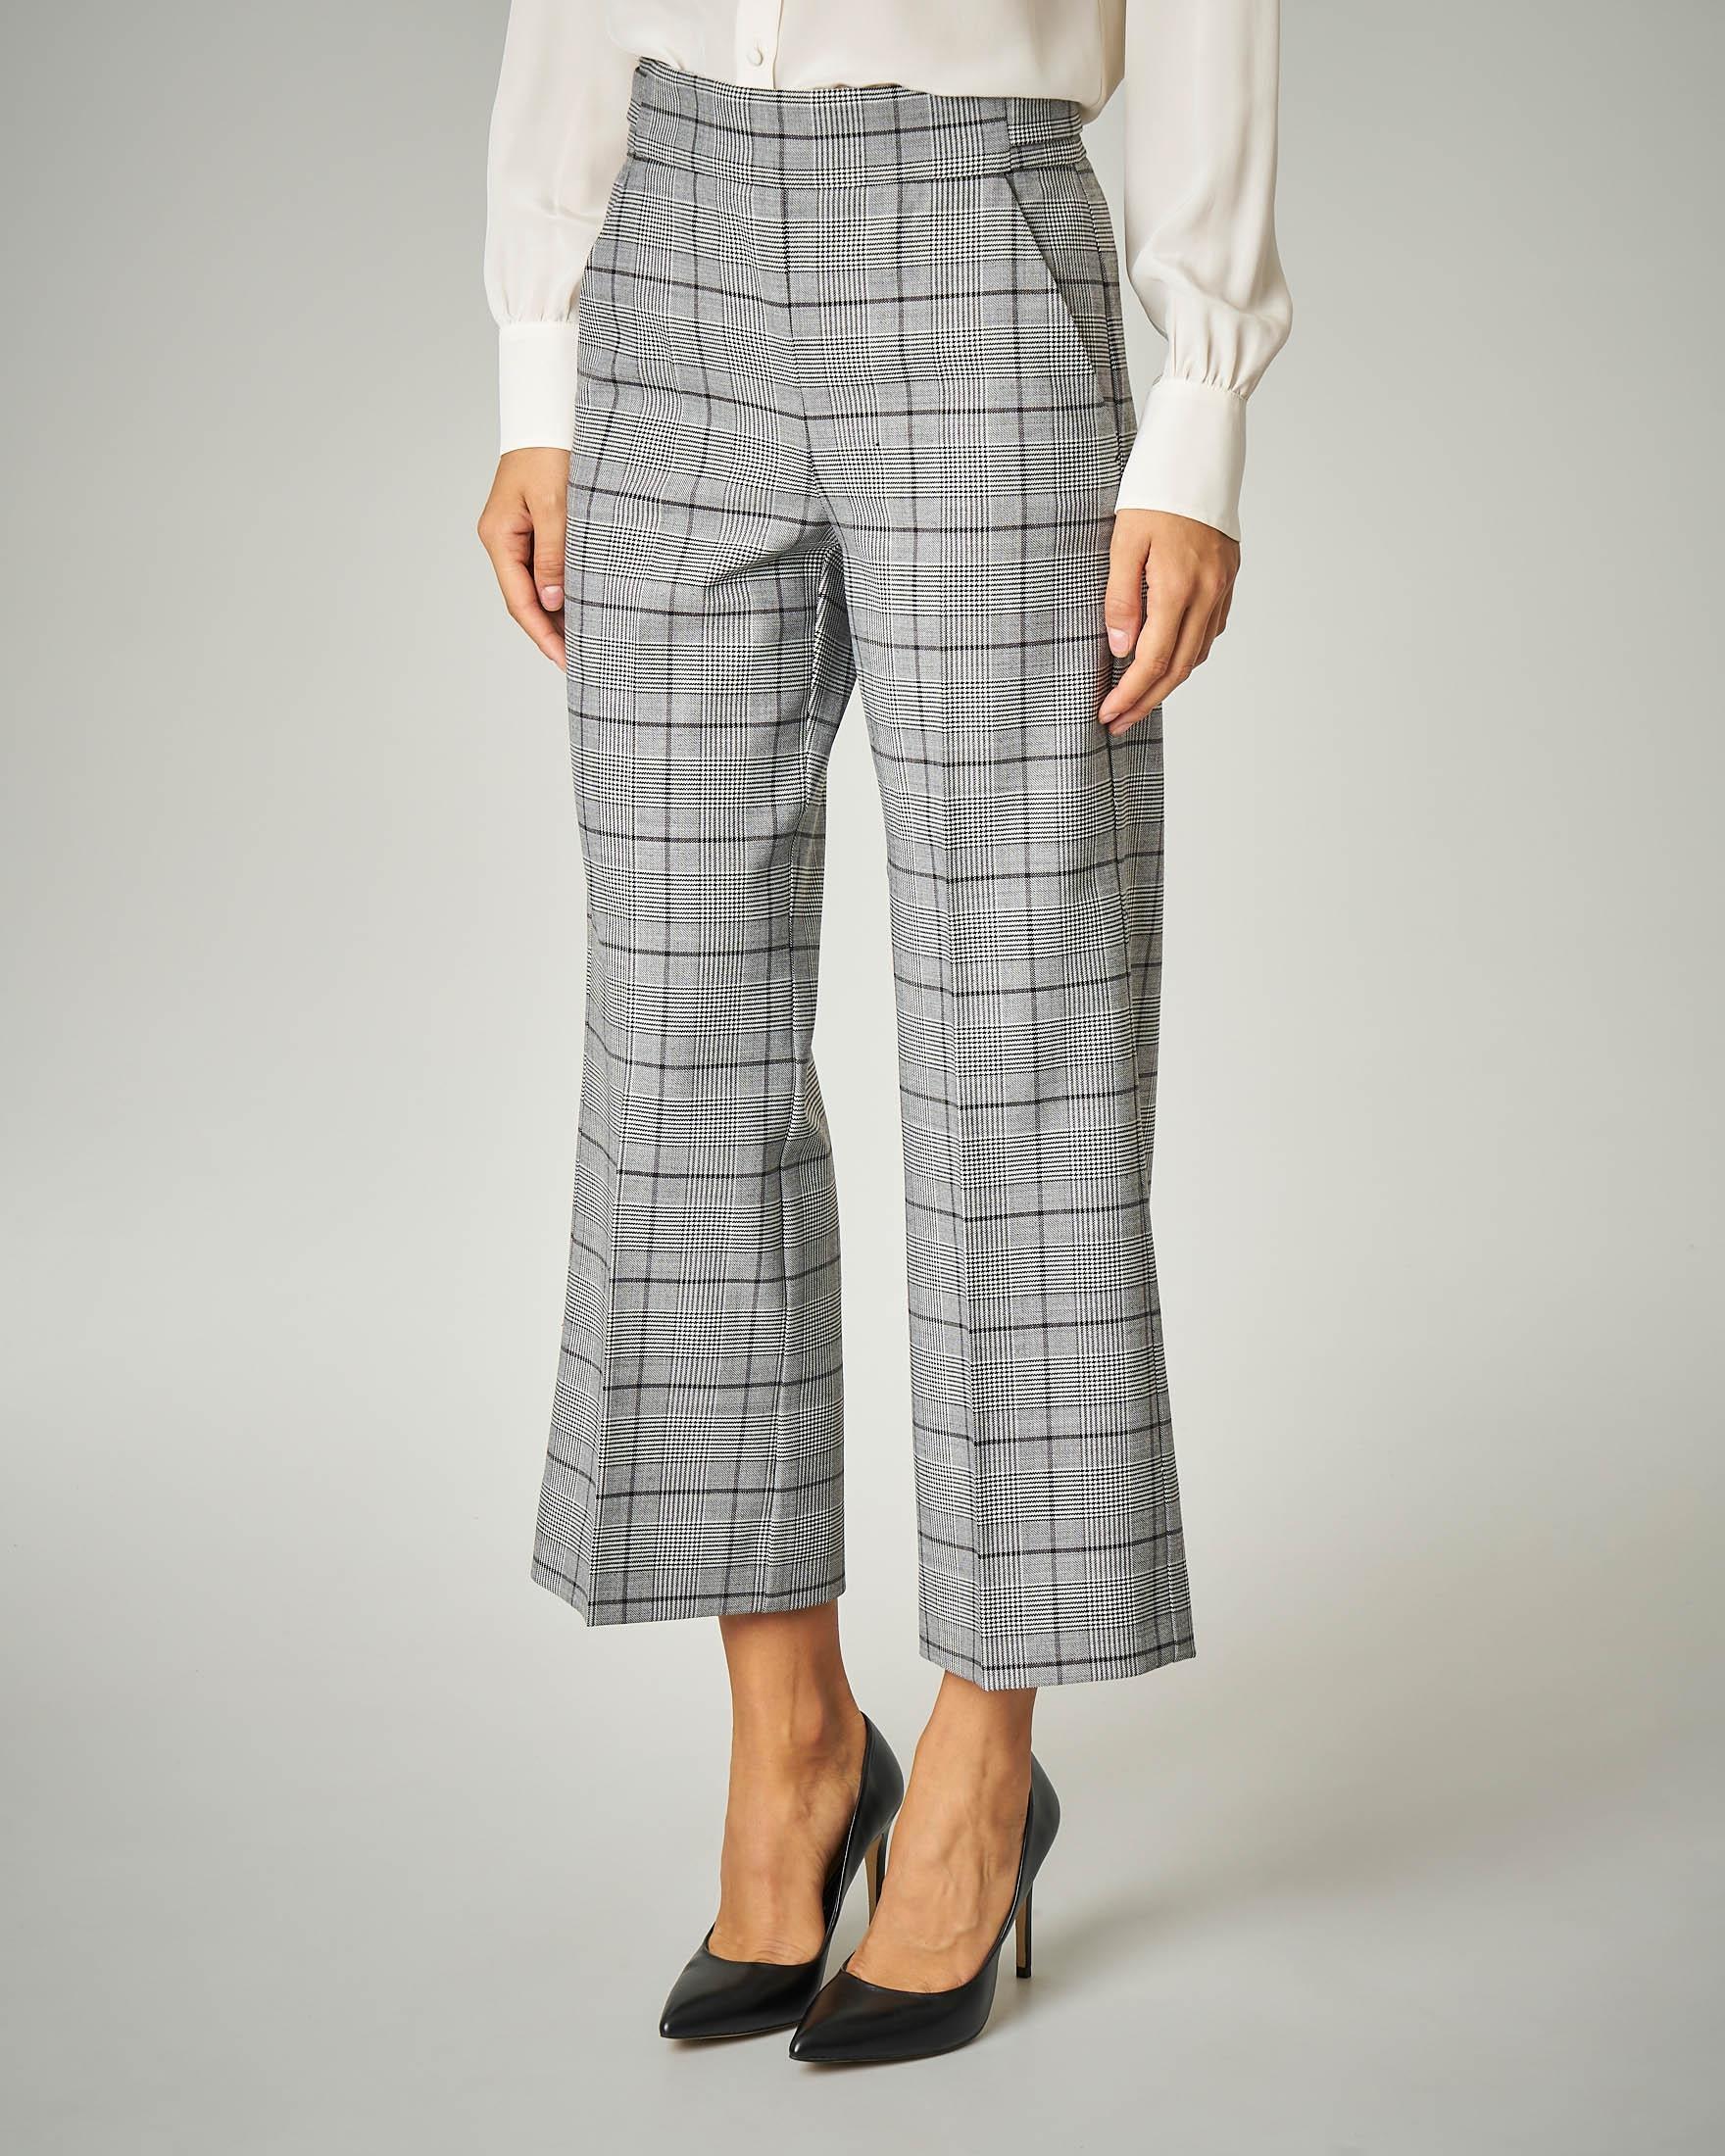 Pantalone cropped in Principe di Galles.